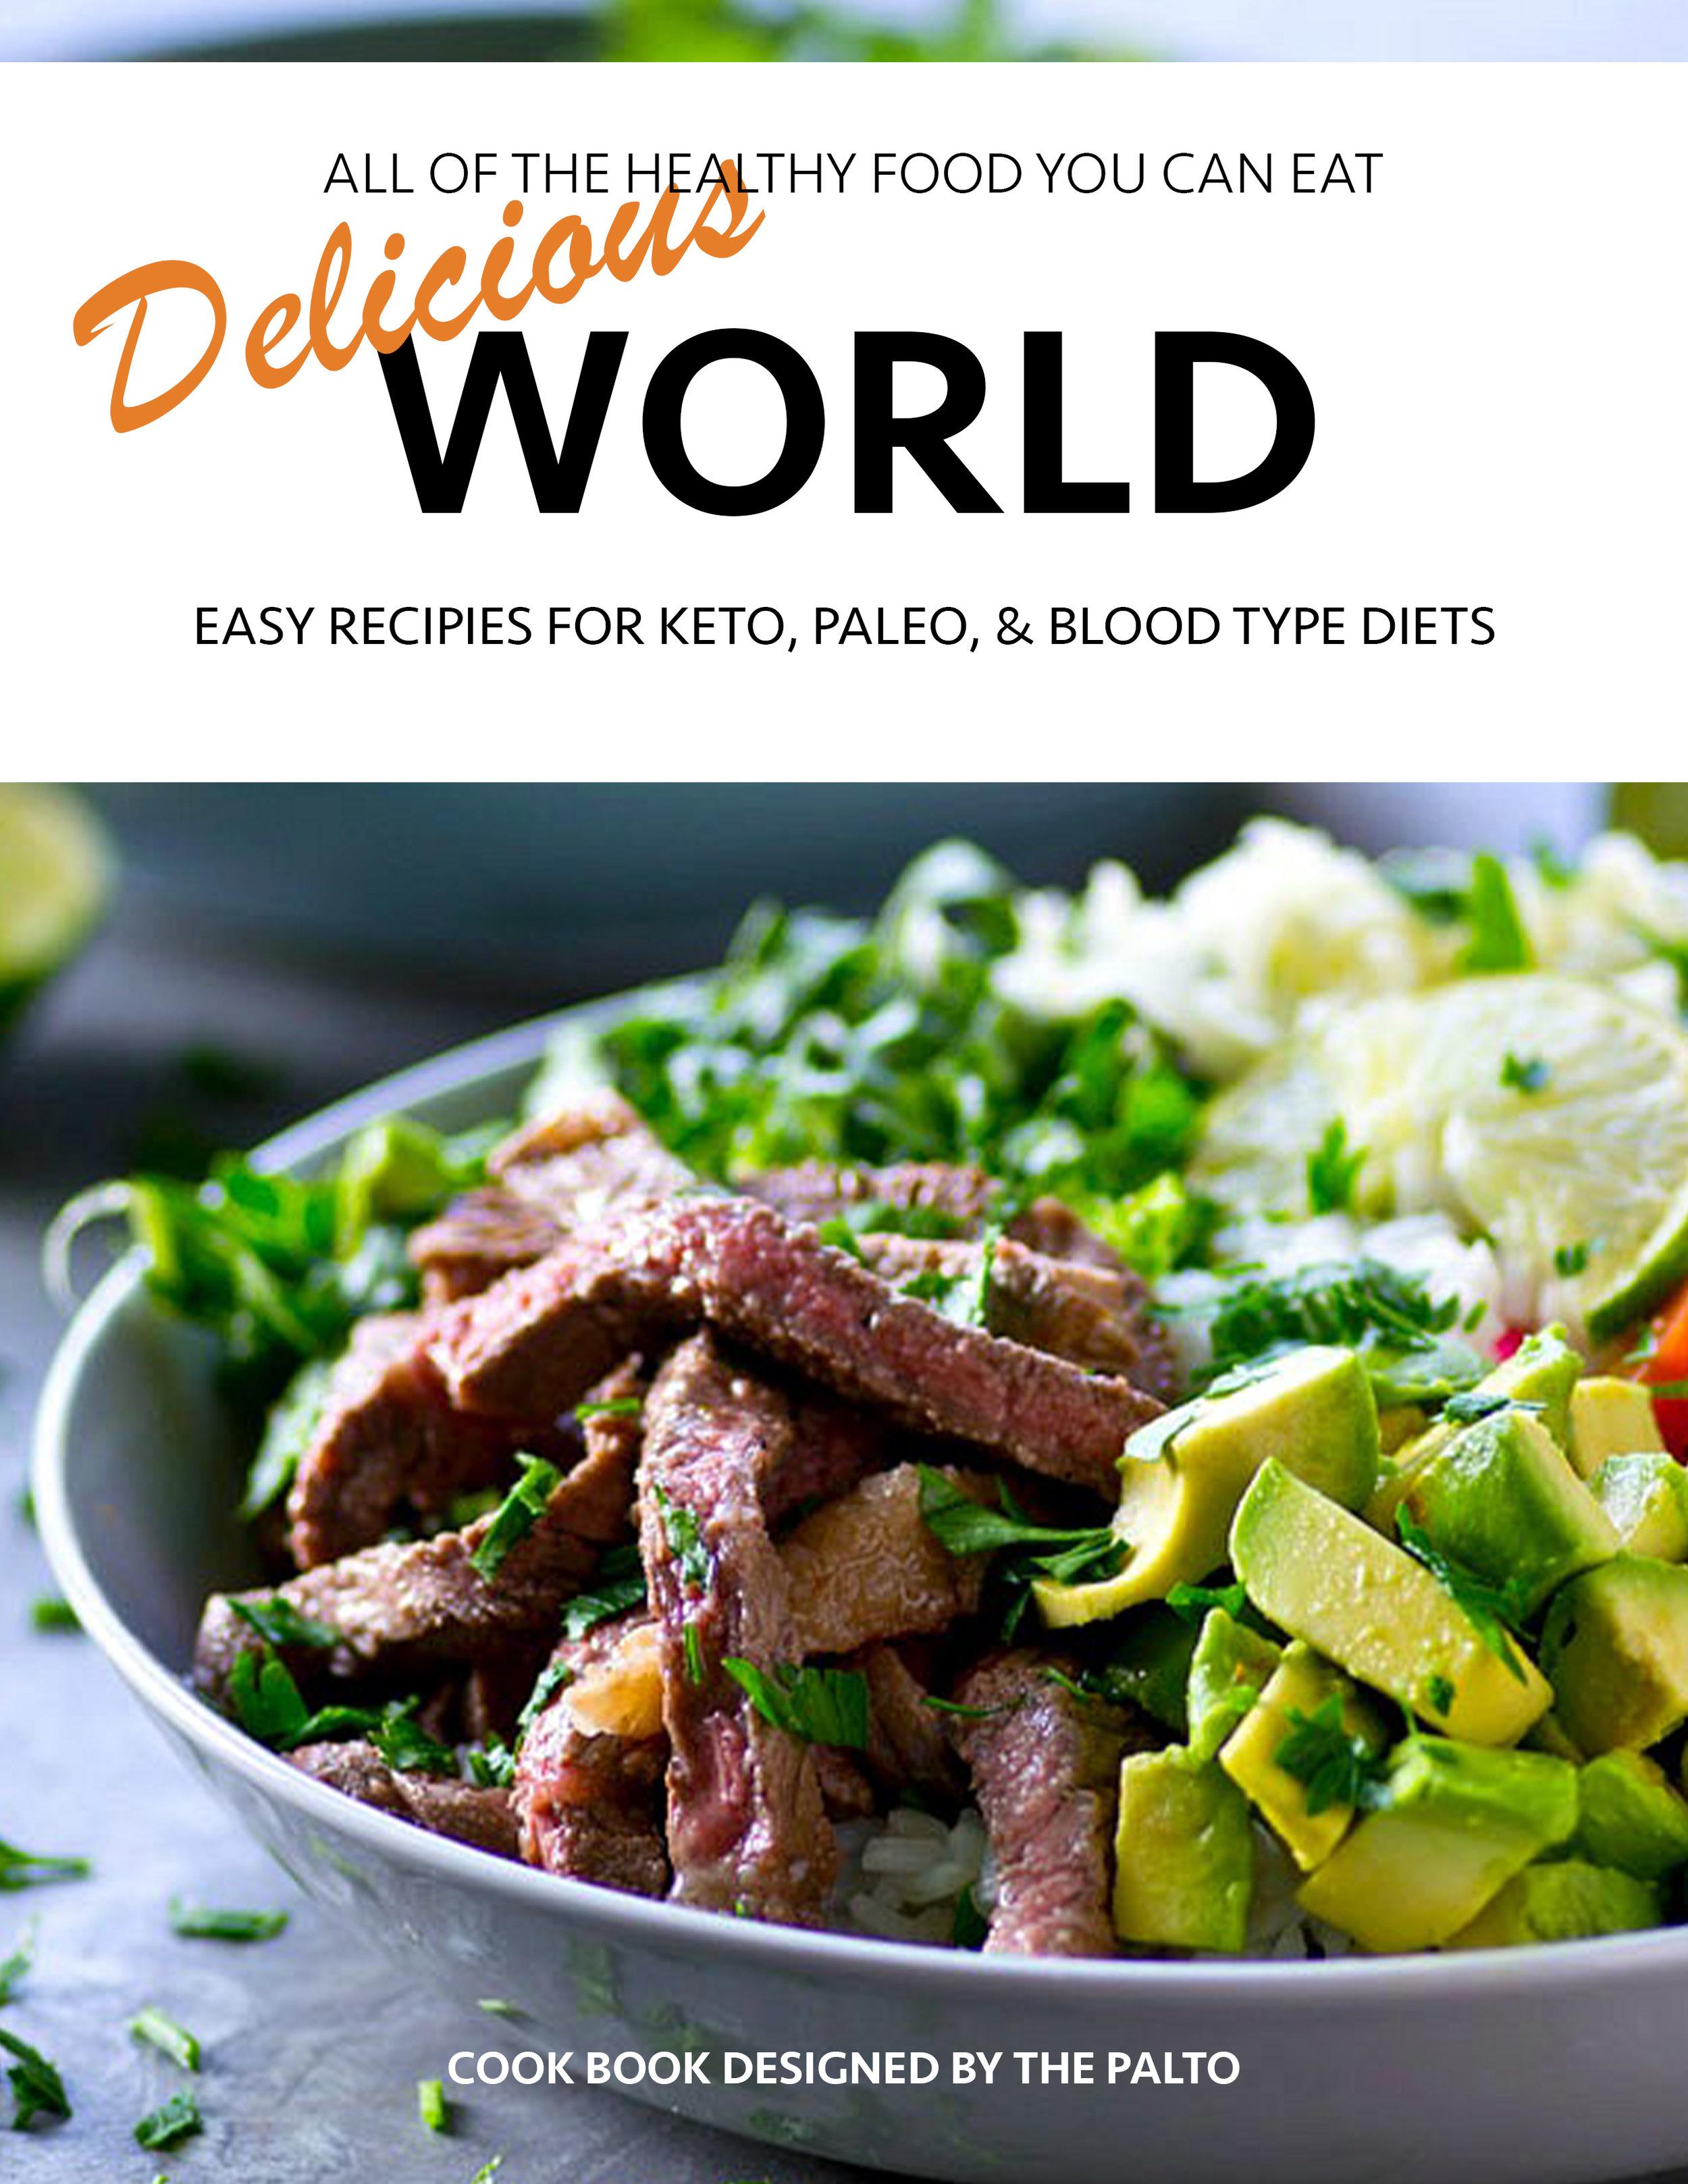 Delicious World Cook Book.jpg